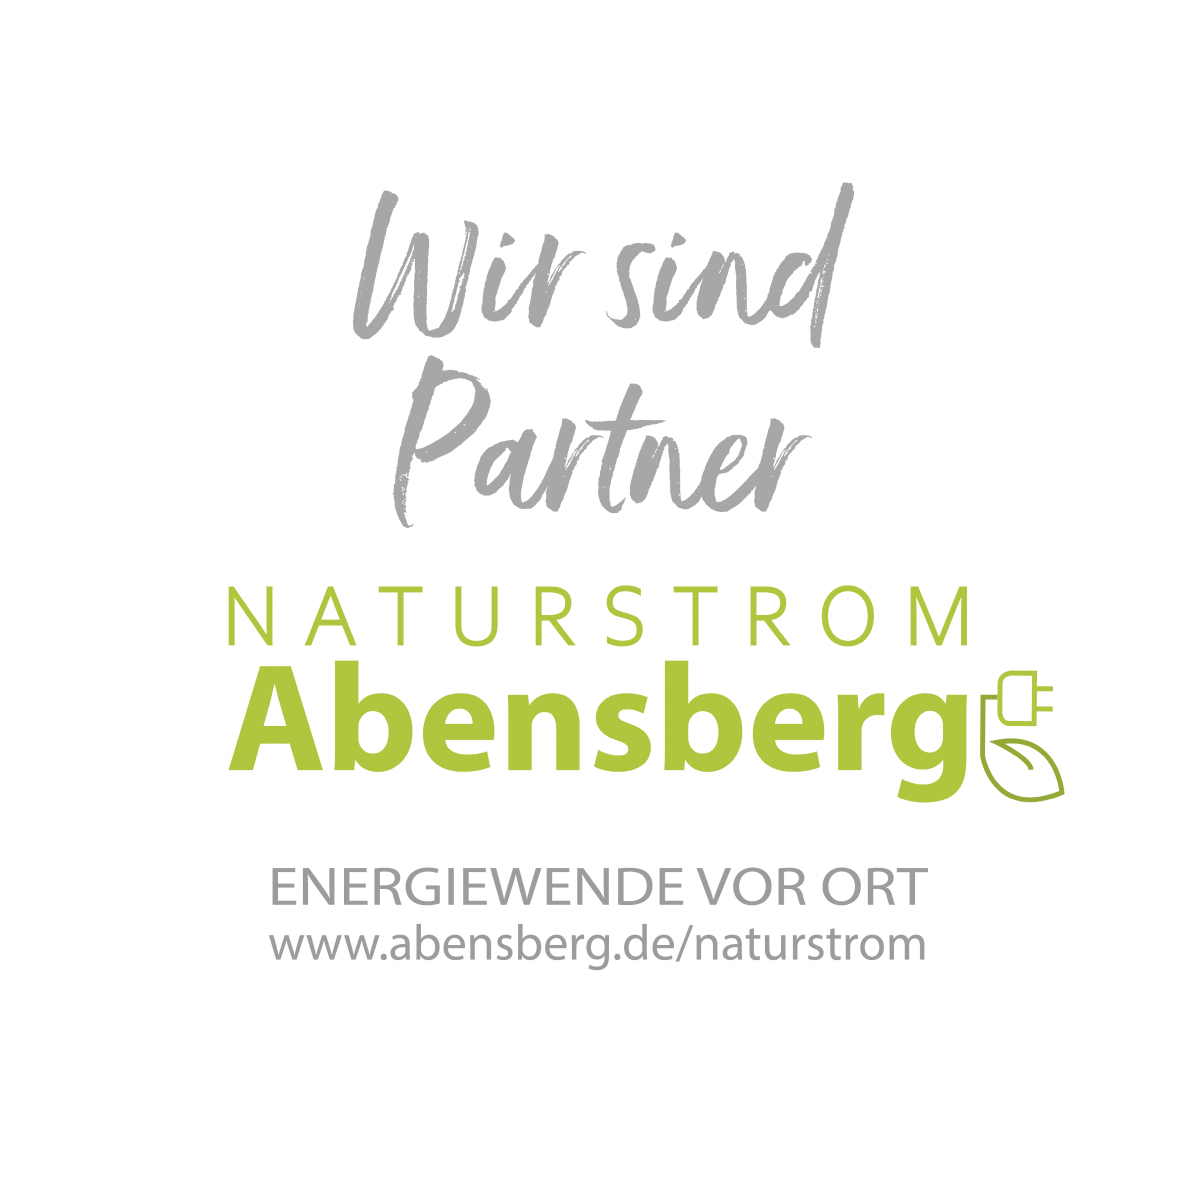 Naturstrom Abensberg